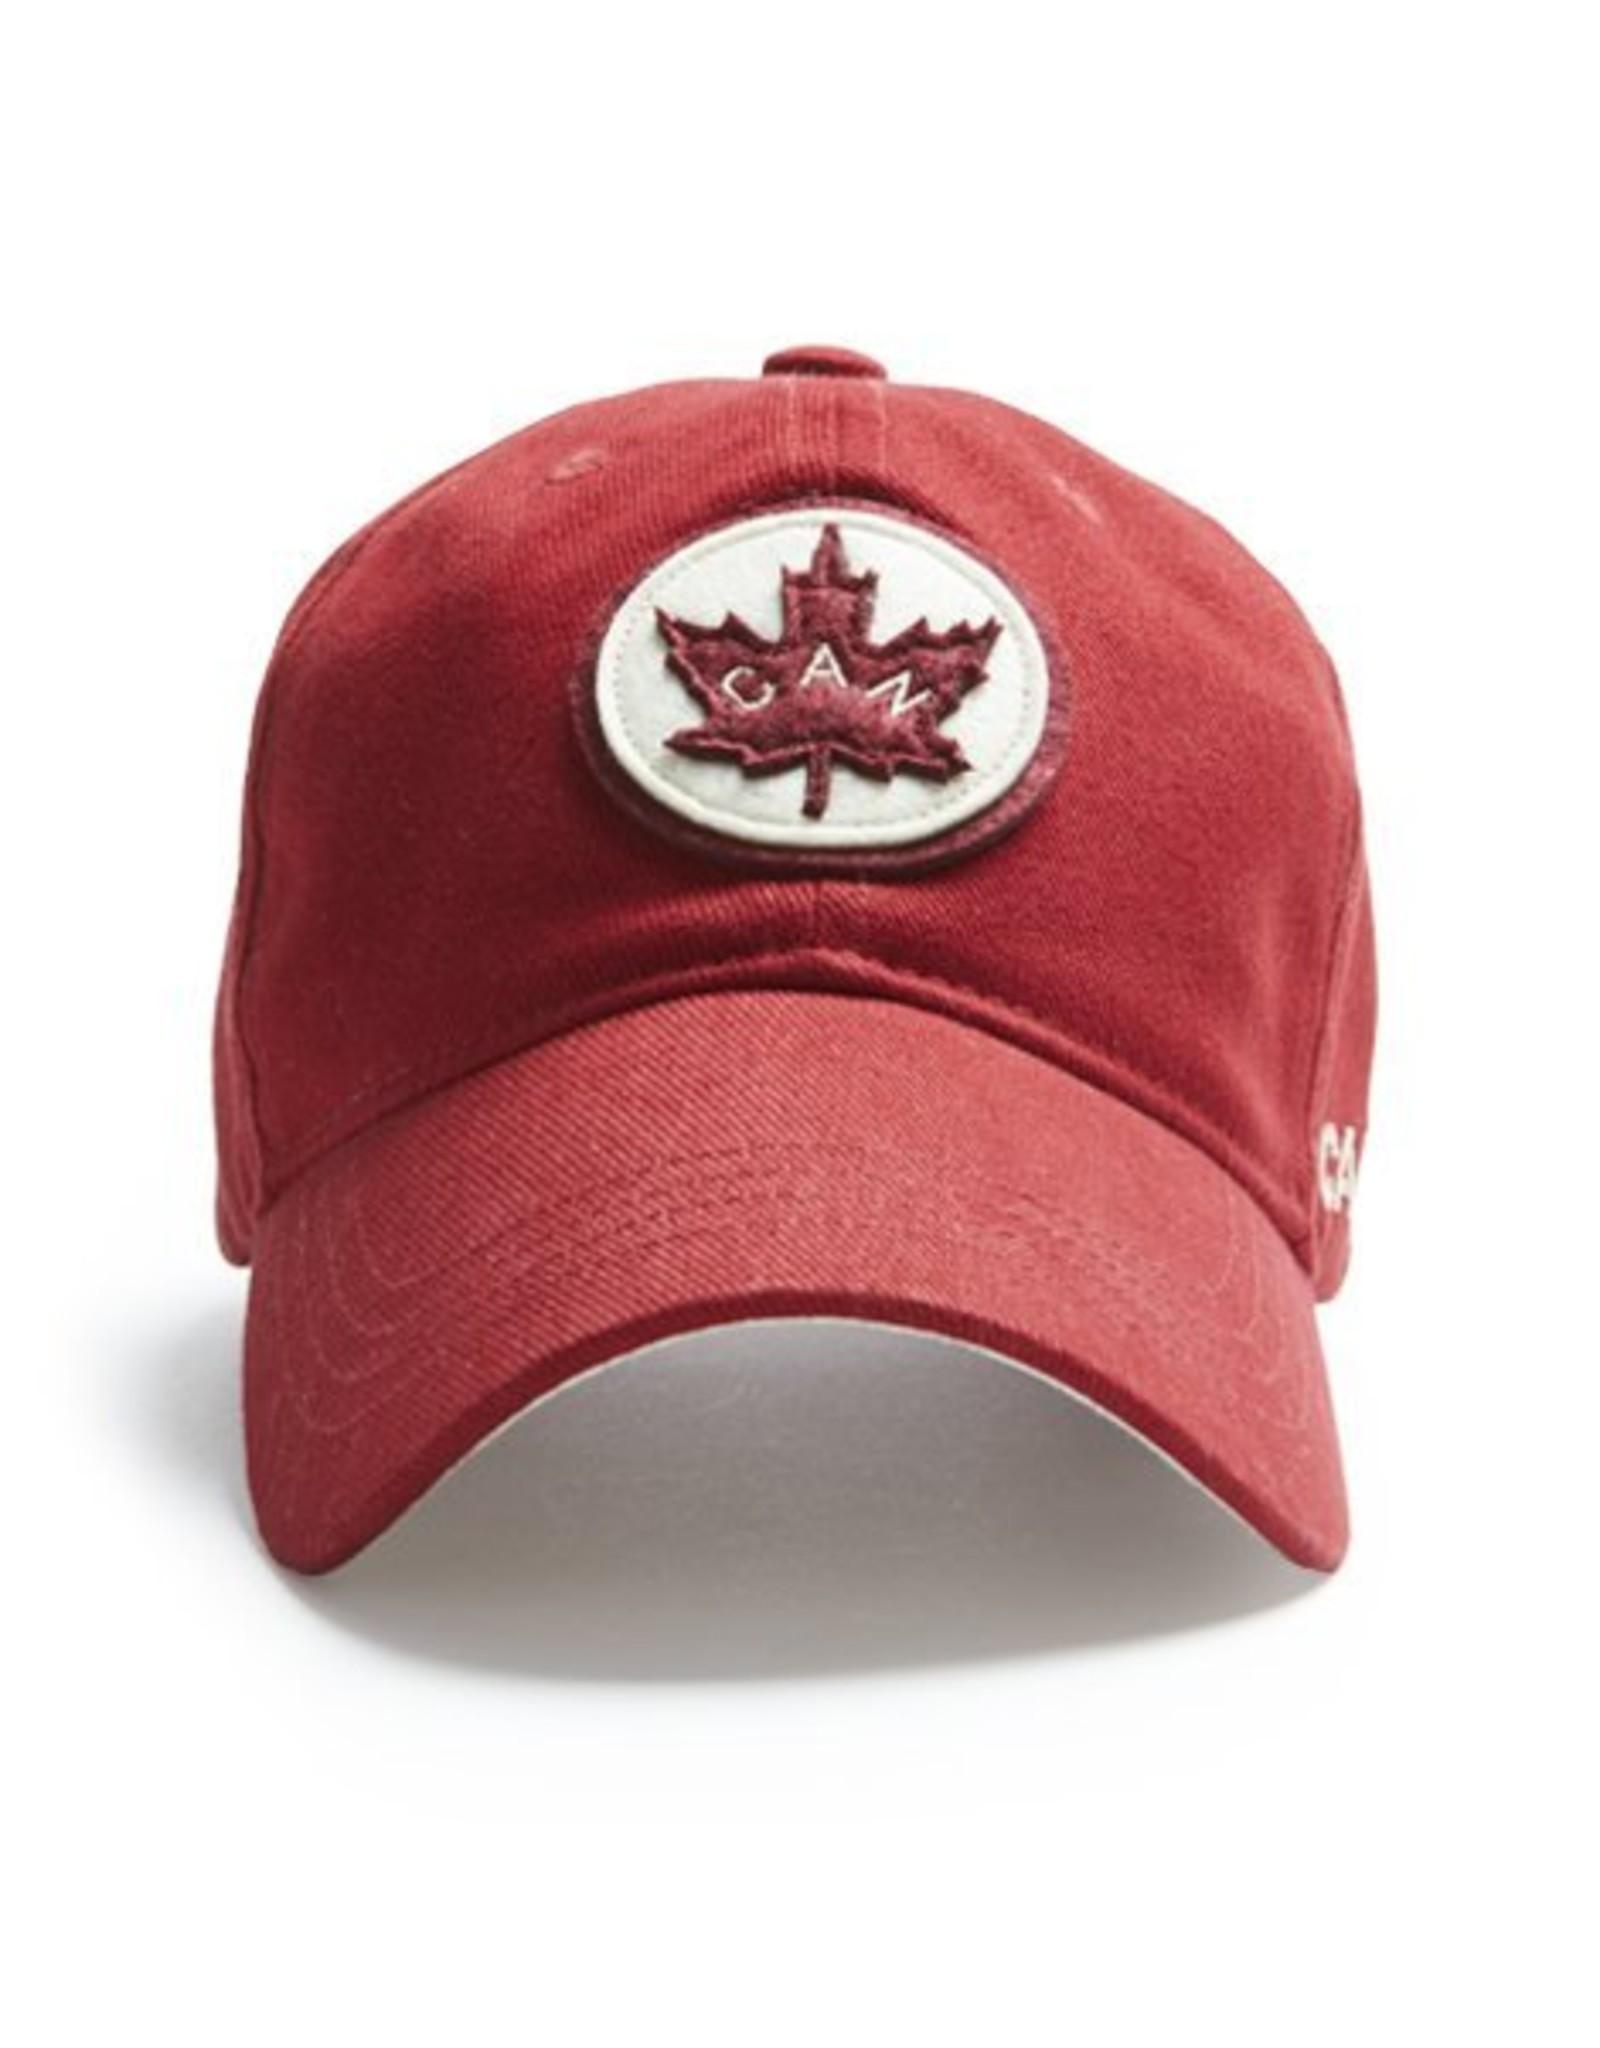 Red Canoe Red Canoe Cap Canada